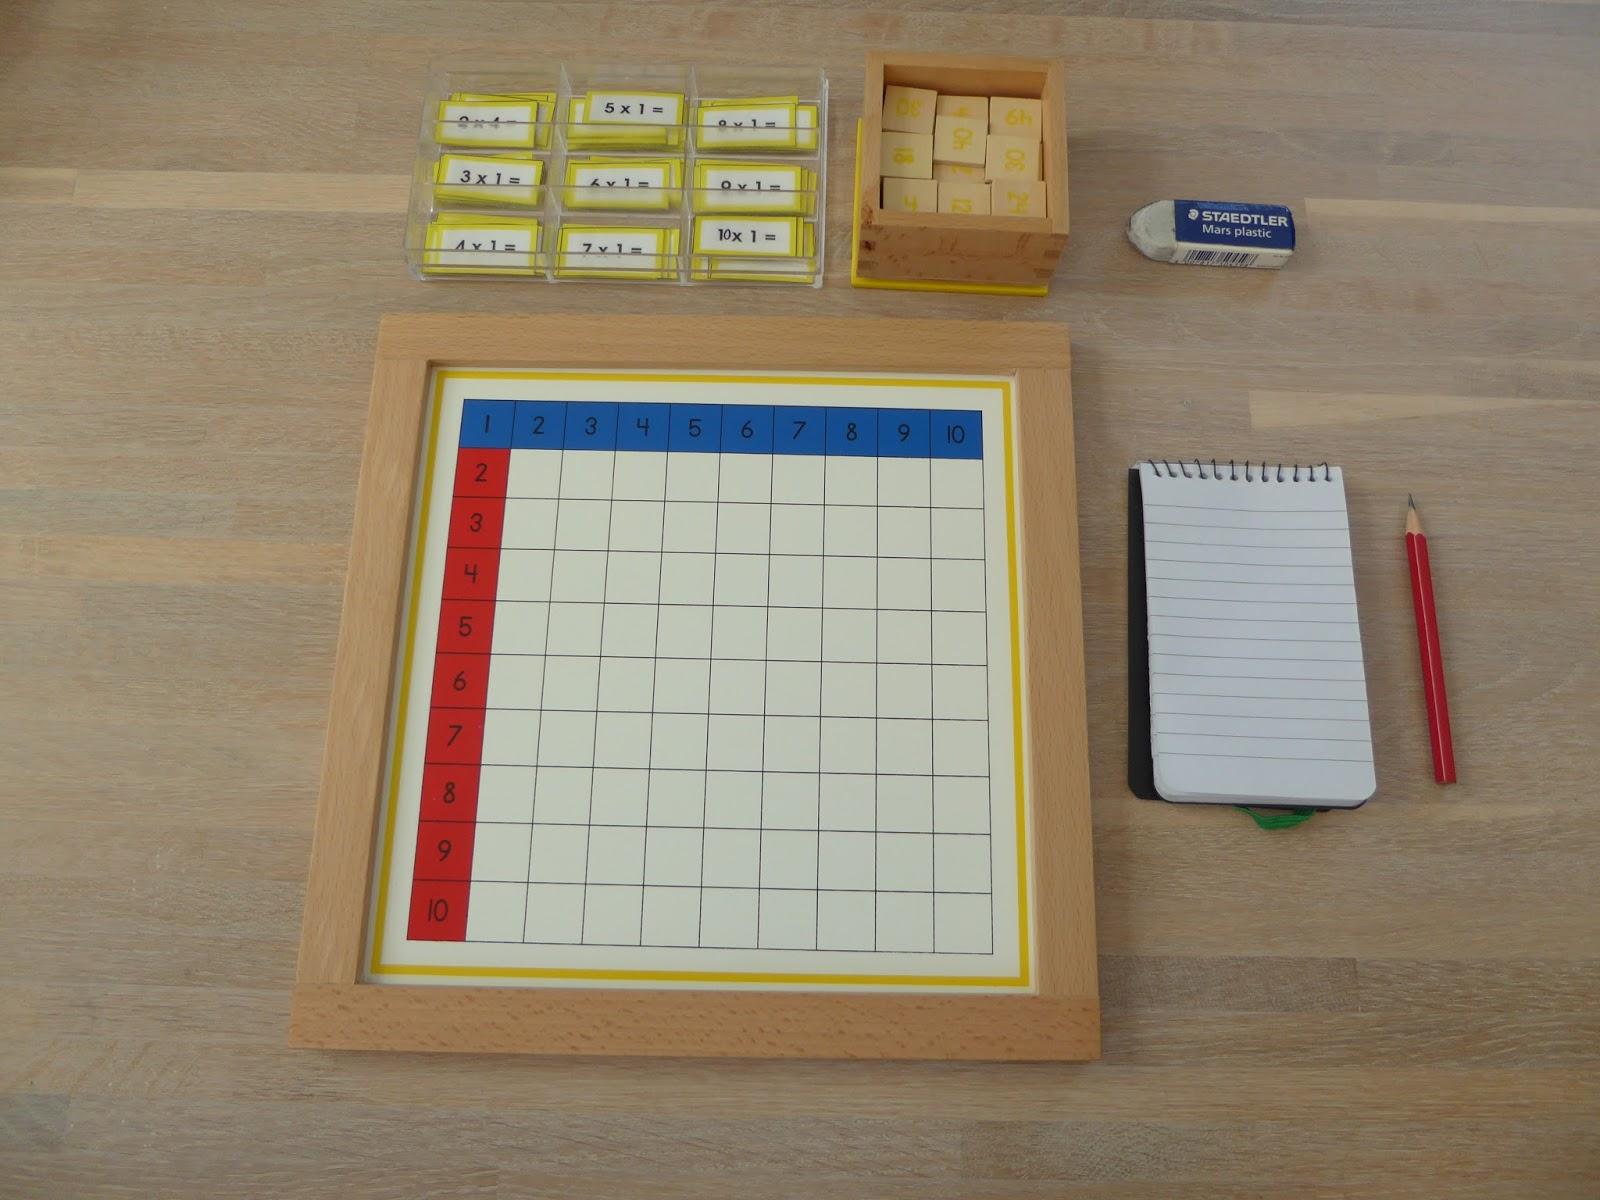 Family fecs montessori activity multiplication finger working montessori activity multiplication finger working chart 5 the blank multiplication chart nvjuhfo Image collections